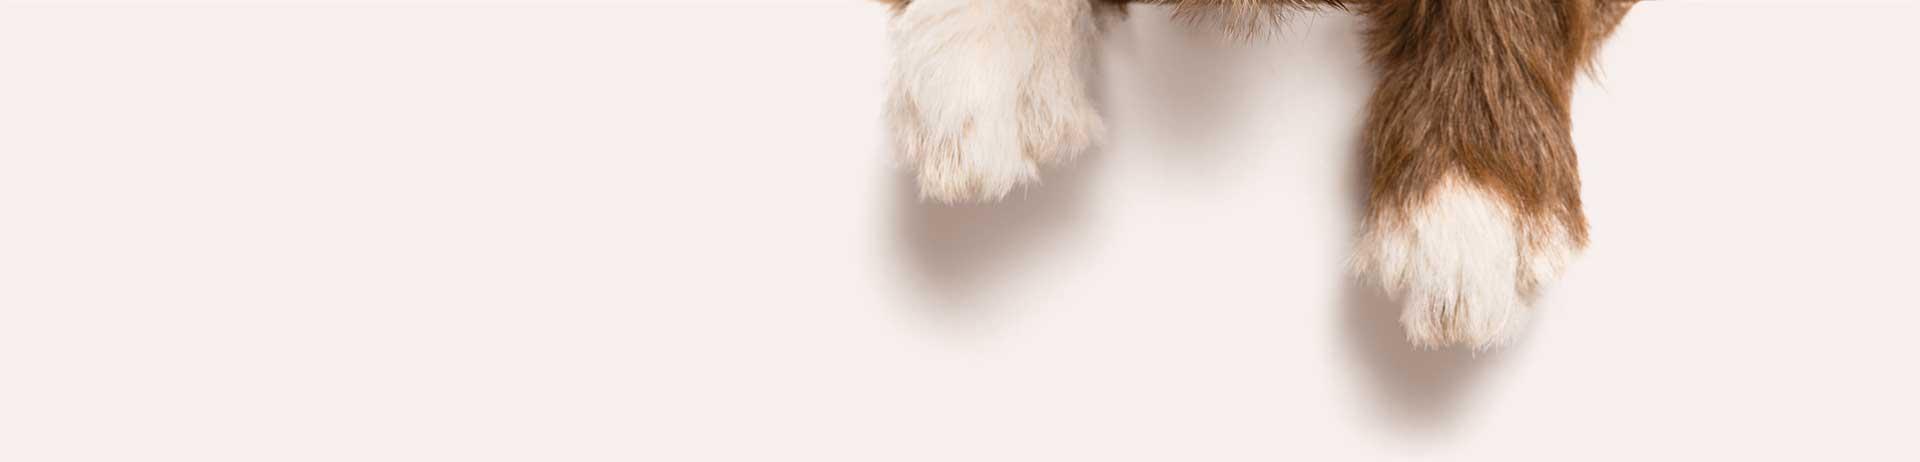 Branding, packaging and website Design for Dog food supplements